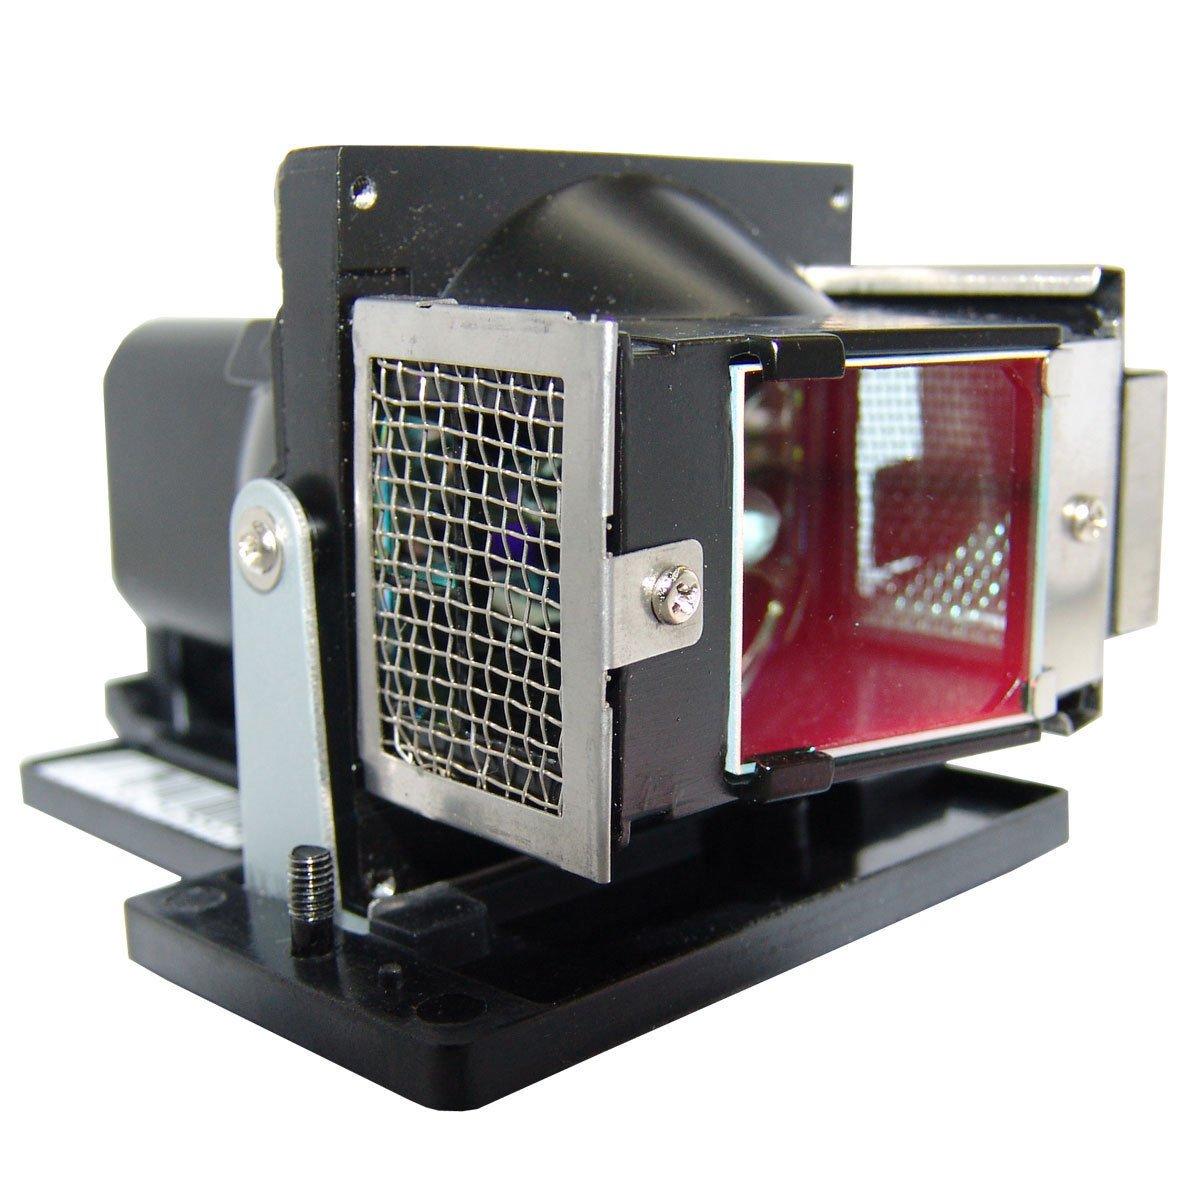 Supermait BL-FS220B / SP-LAMP-076 プロジェクター交換用ランプ 汎用 150日間安心保証つき 適用機種: TW1692 / TX7156 対応   B078W8VCL9